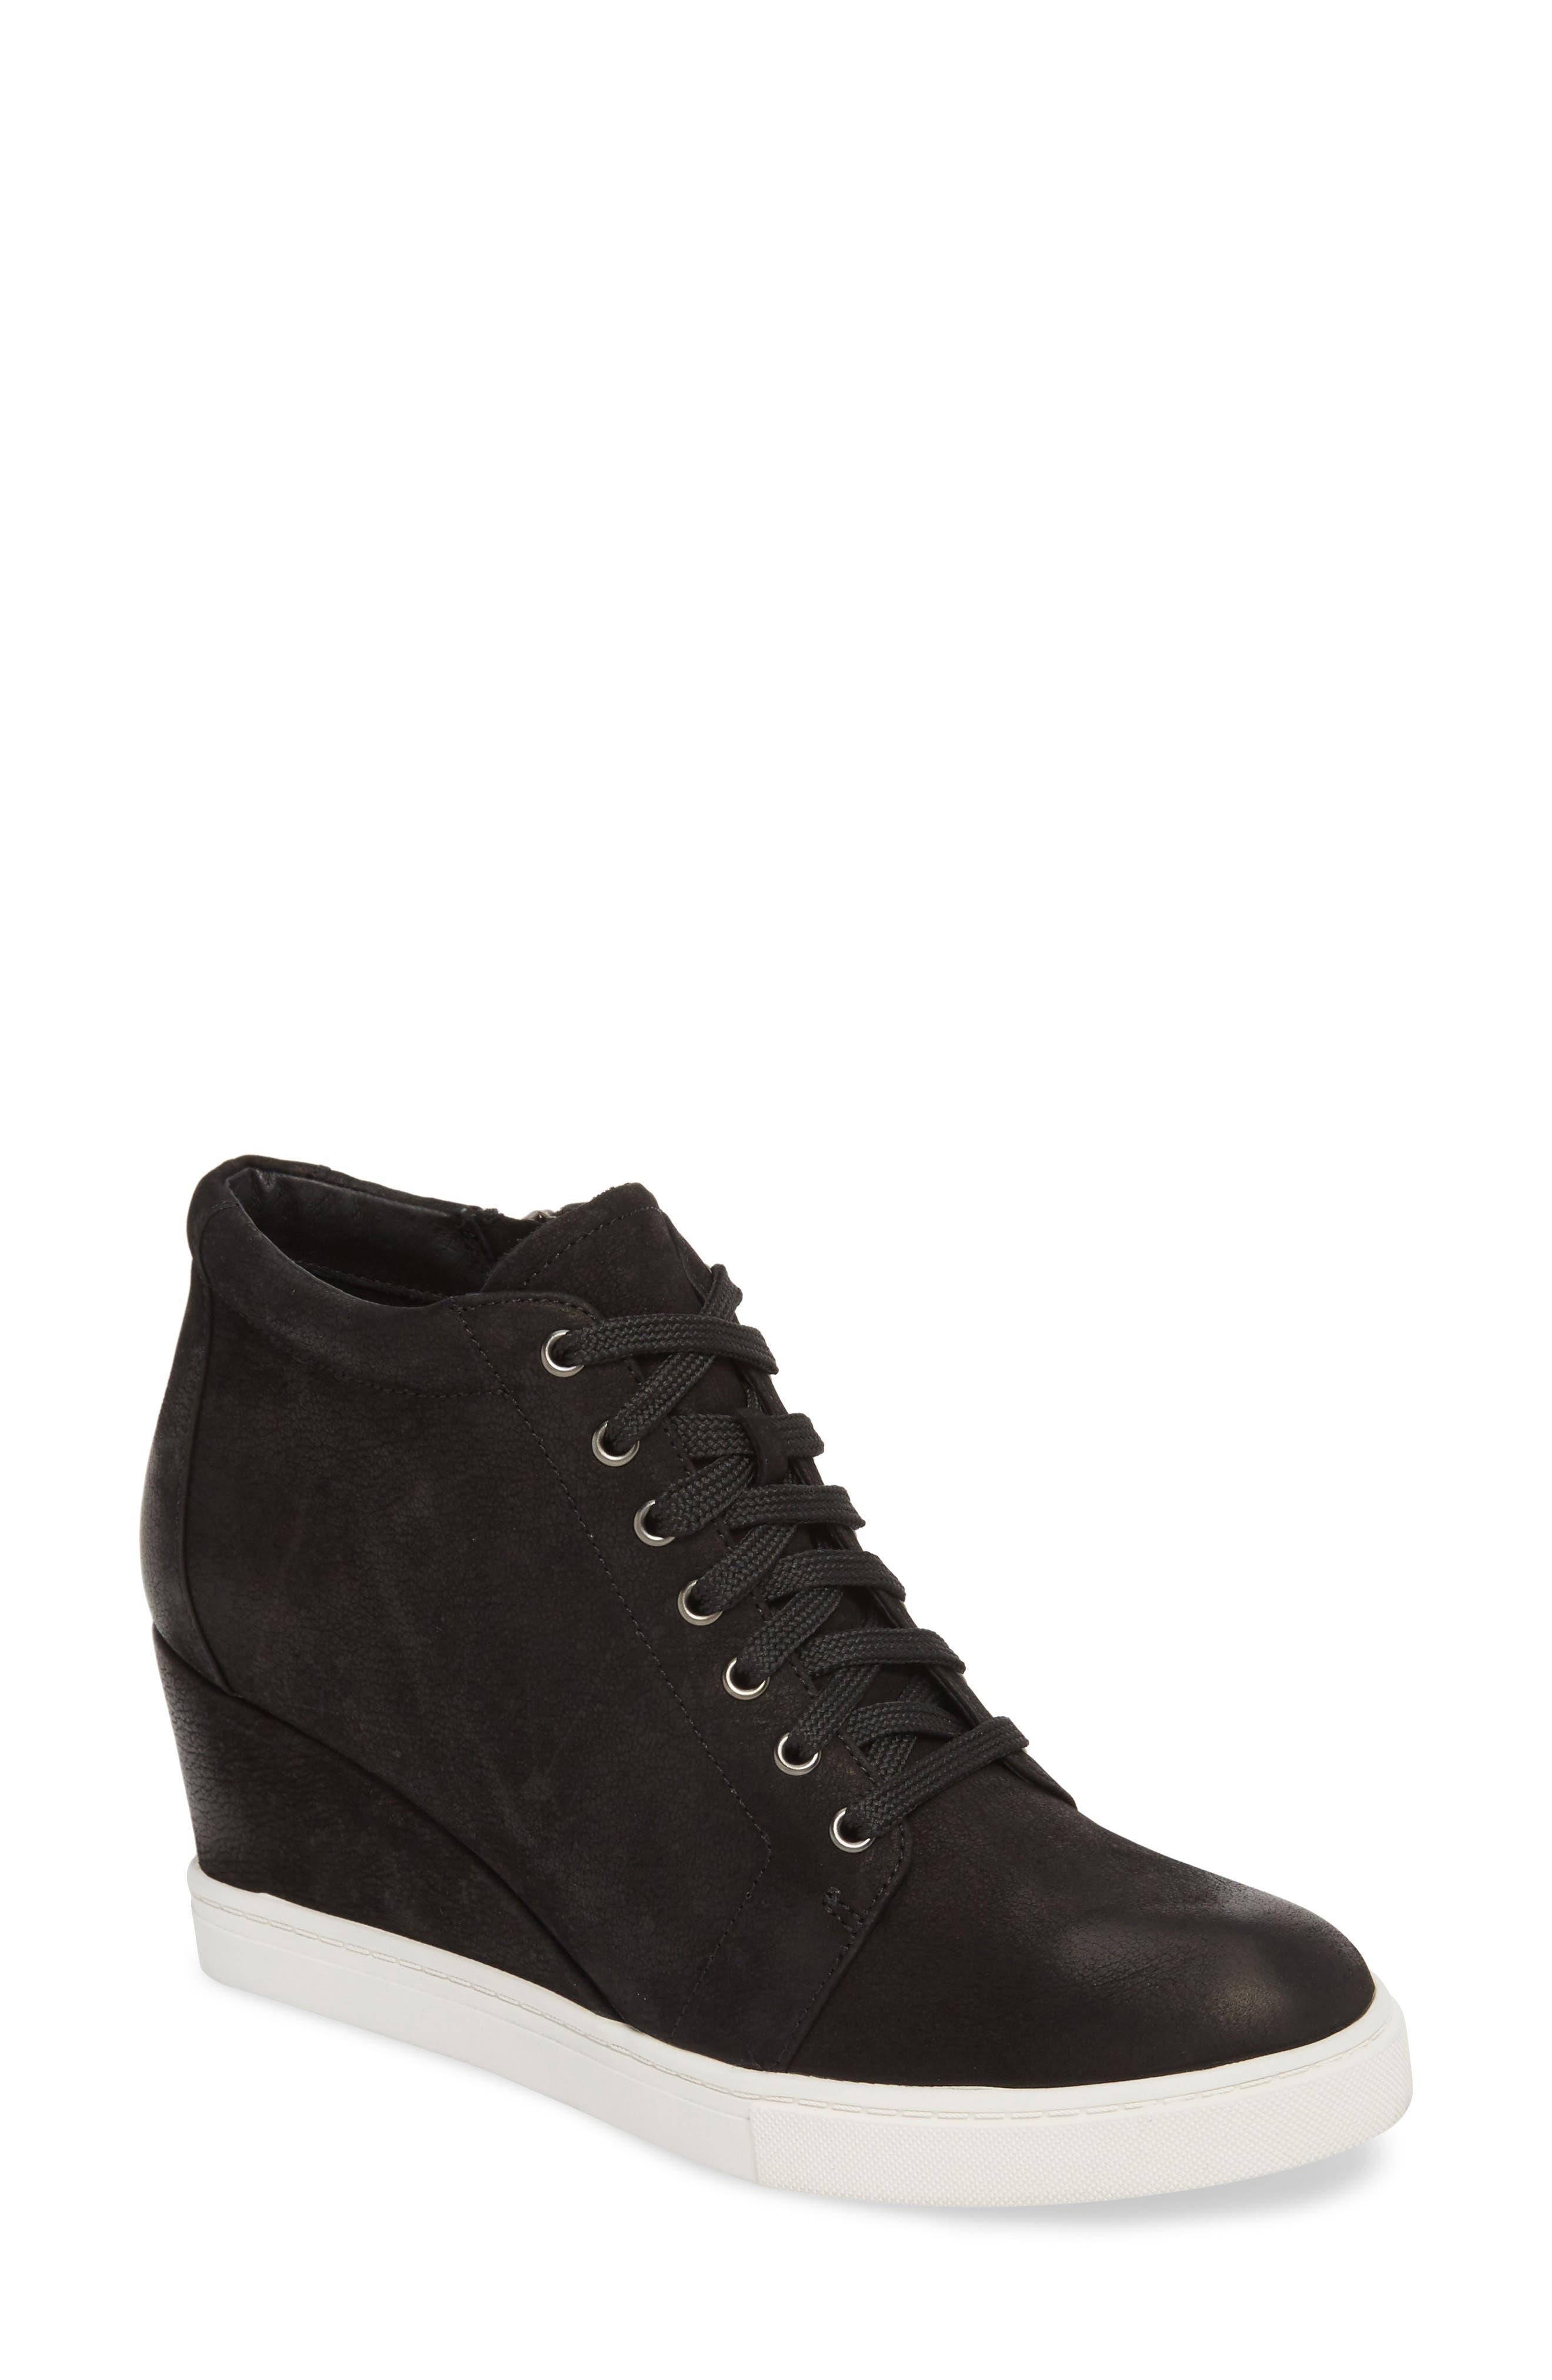 Axel Wedge Sneaker,                             Main thumbnail 1, color,                             BLACK OILED NUBUCK